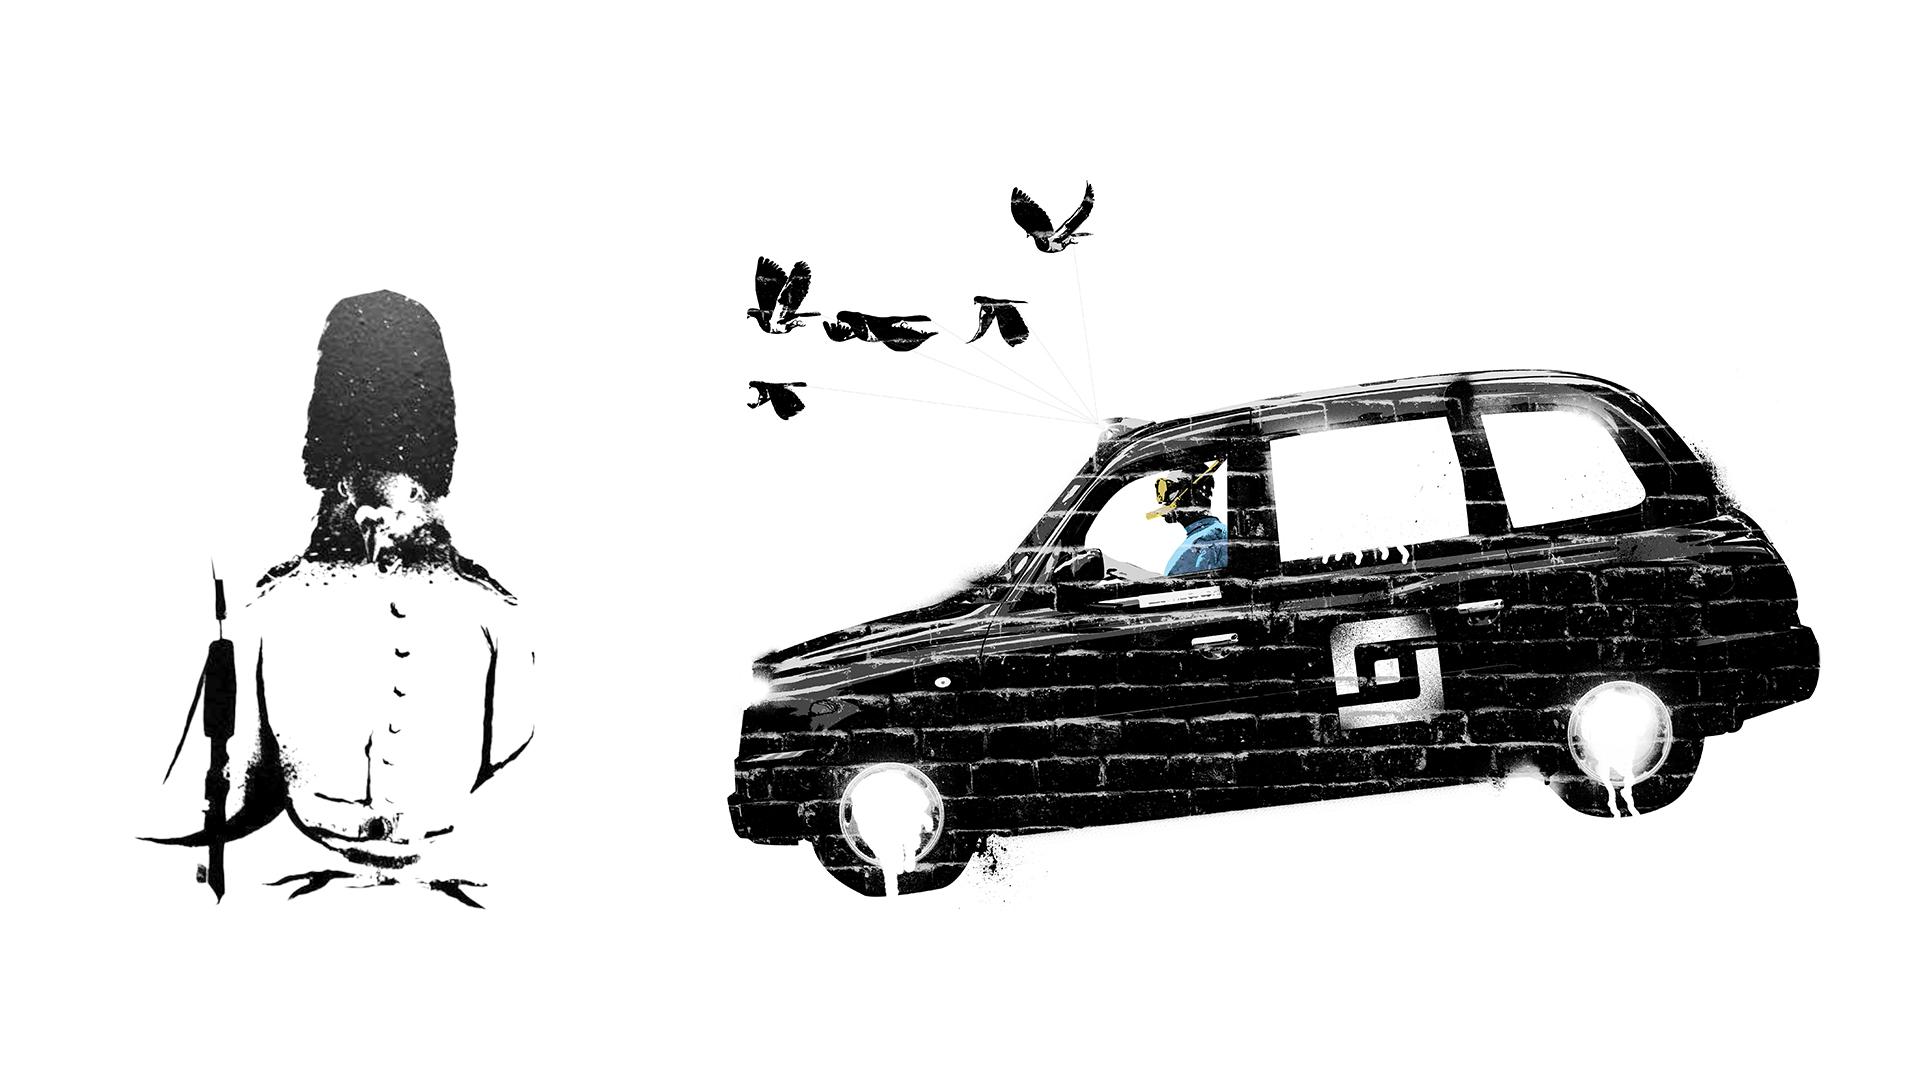 Entrepreneurial Spark Mural Design Pigeon Taxi